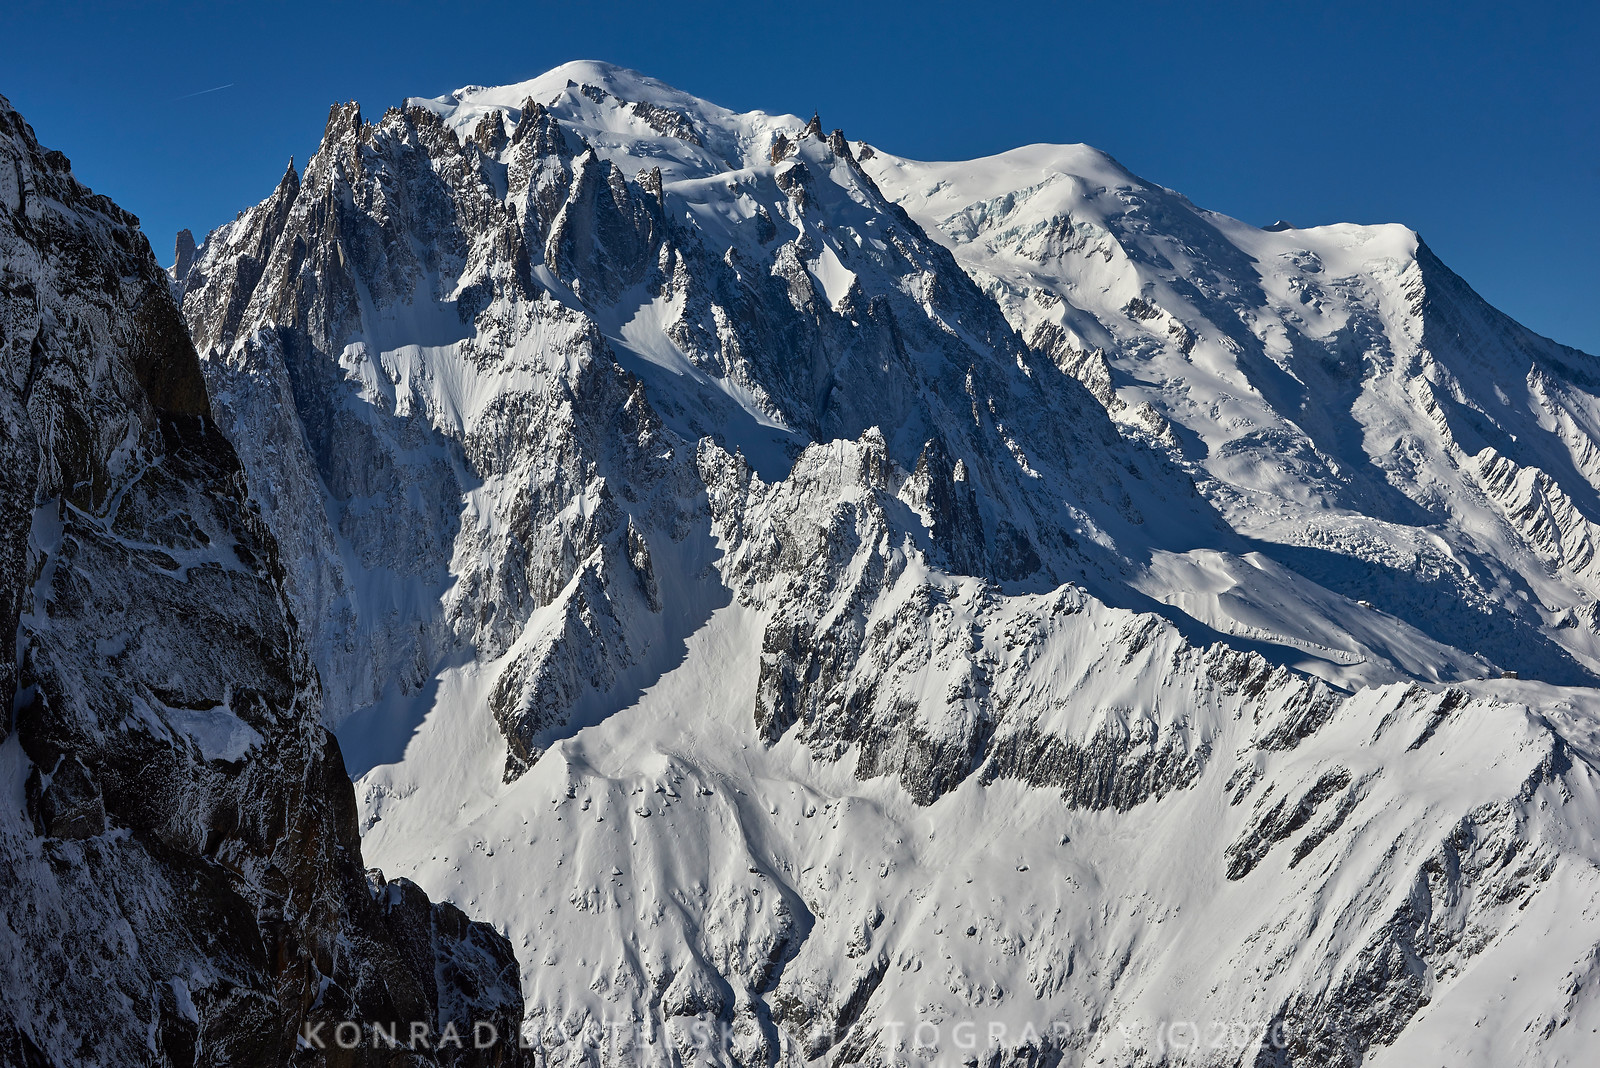 The Massif